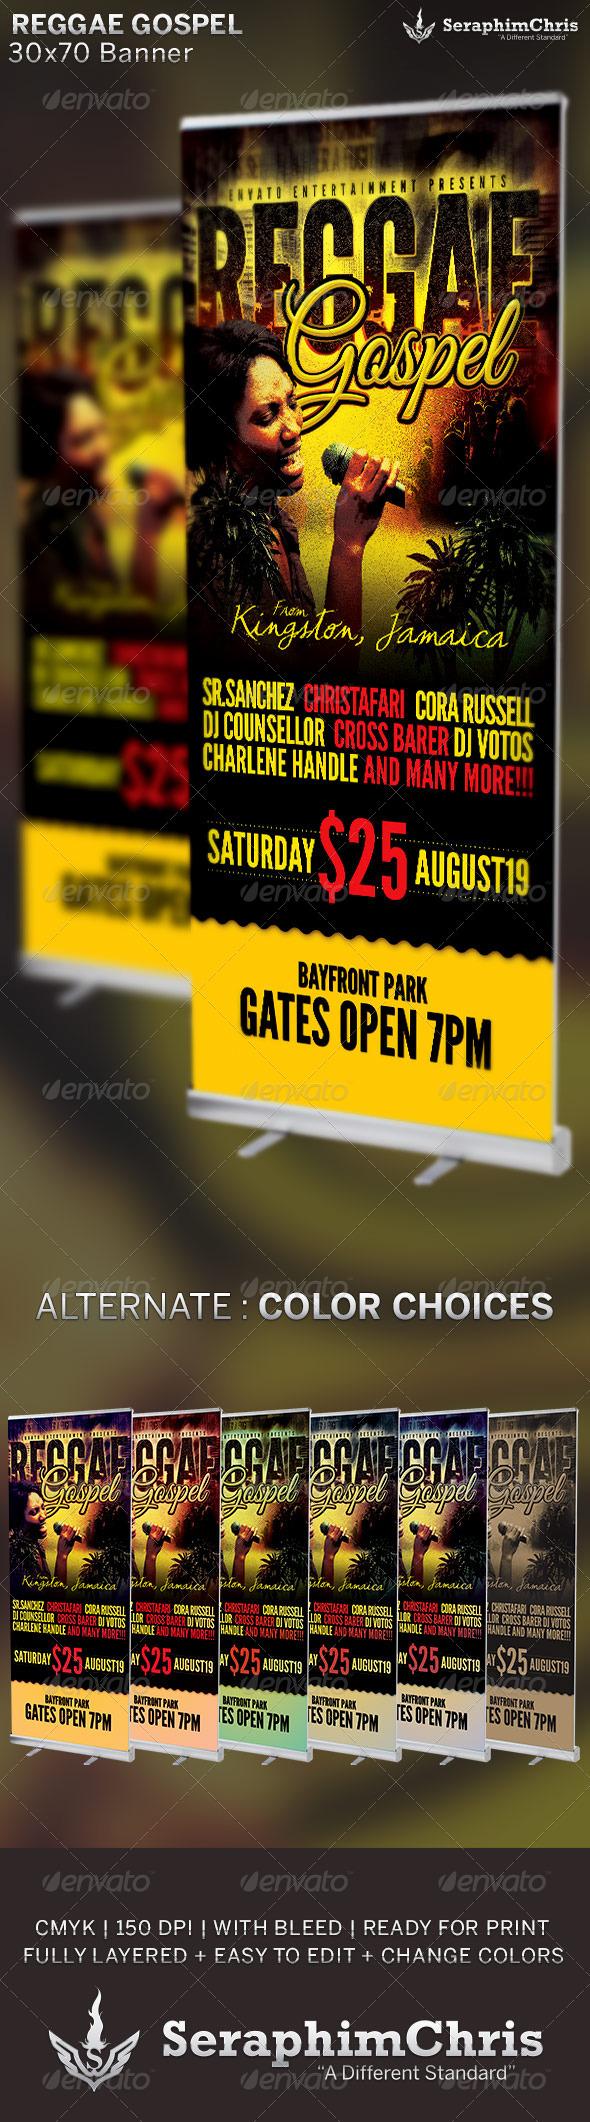 GraphicRiver Reggae Gospel Concert Banner Template 6675587